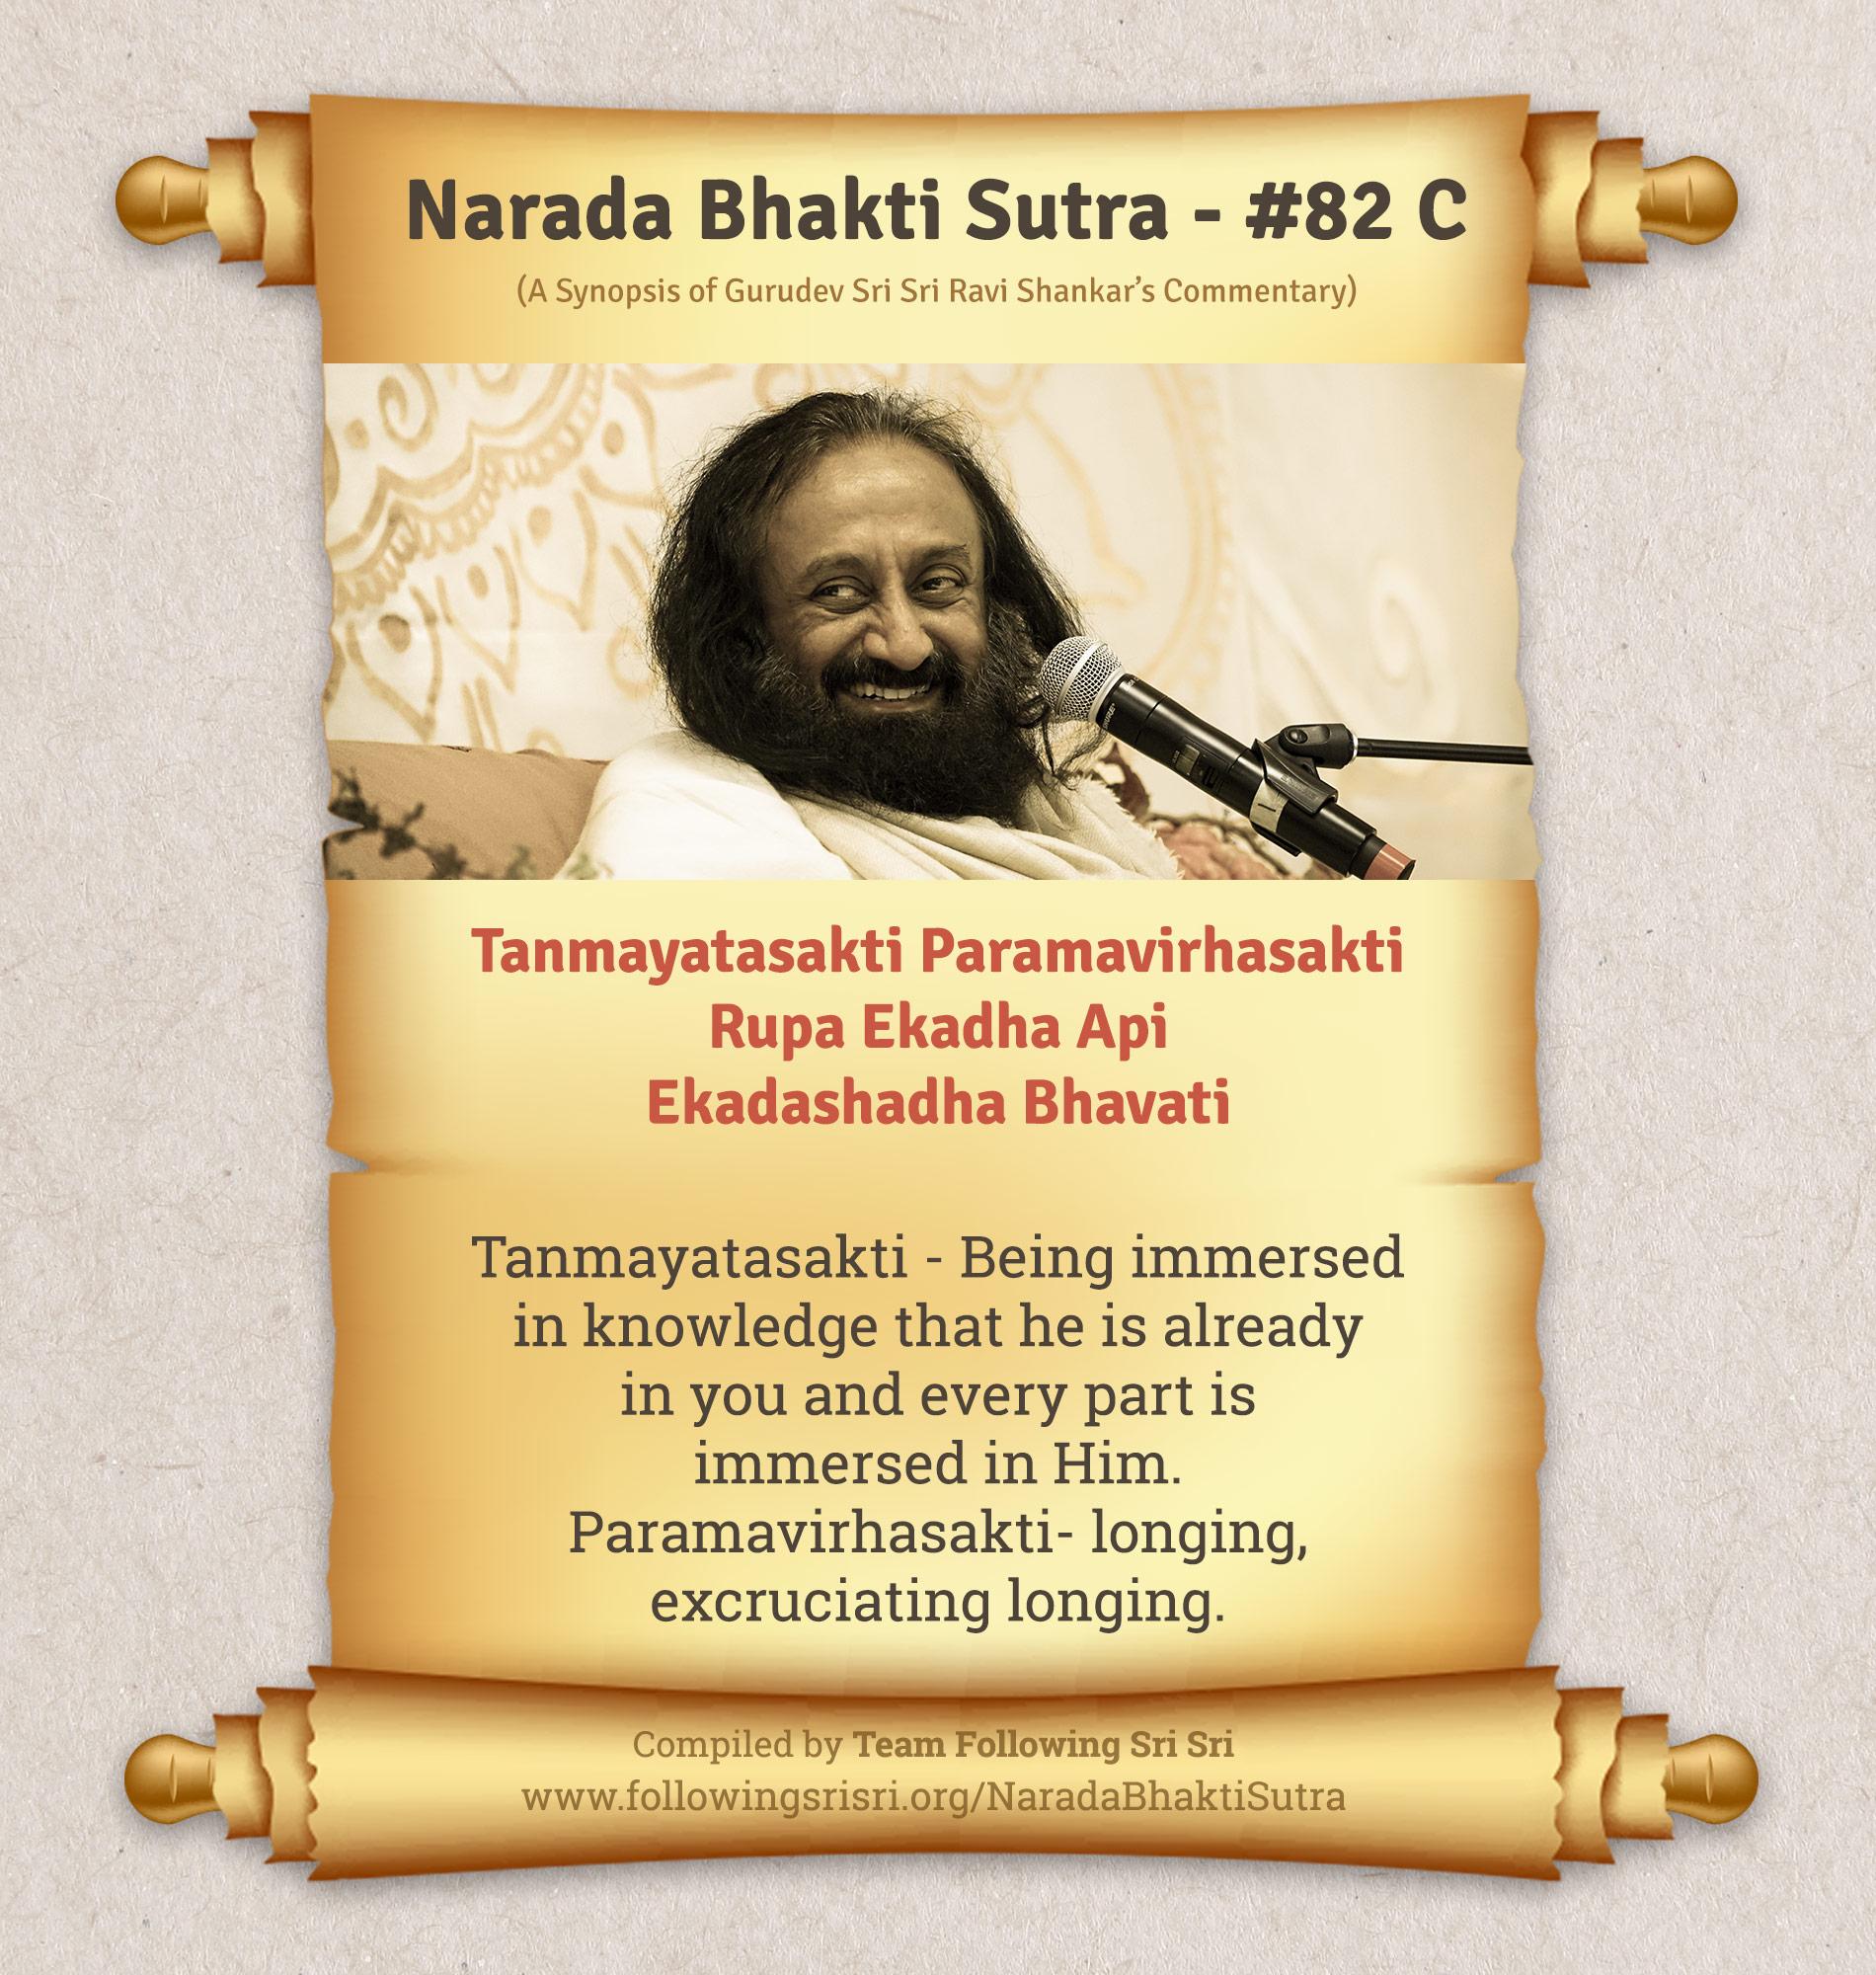 Narada Bhakti Sutras - Sutra 82 C